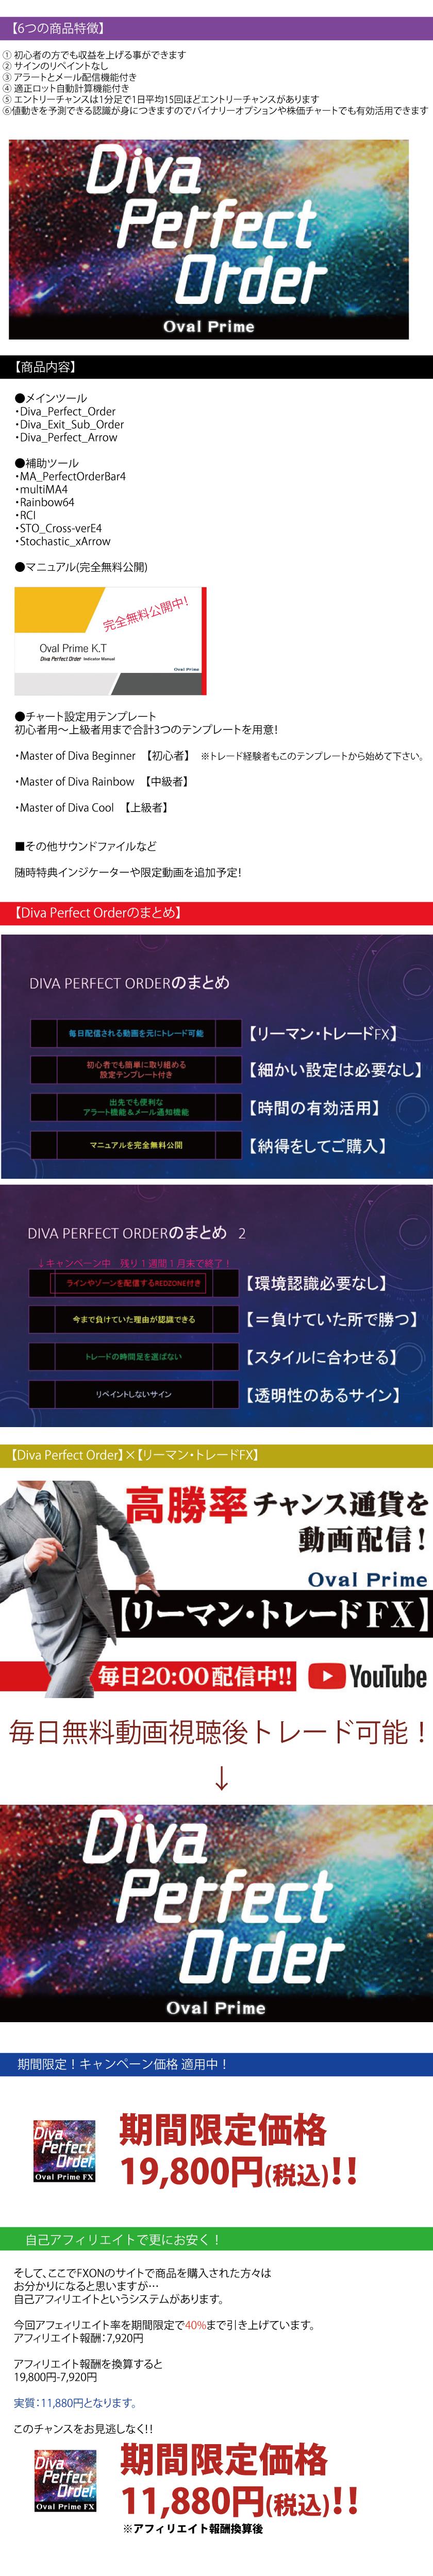 Diva-Perfect-Order-LP-2.jpg